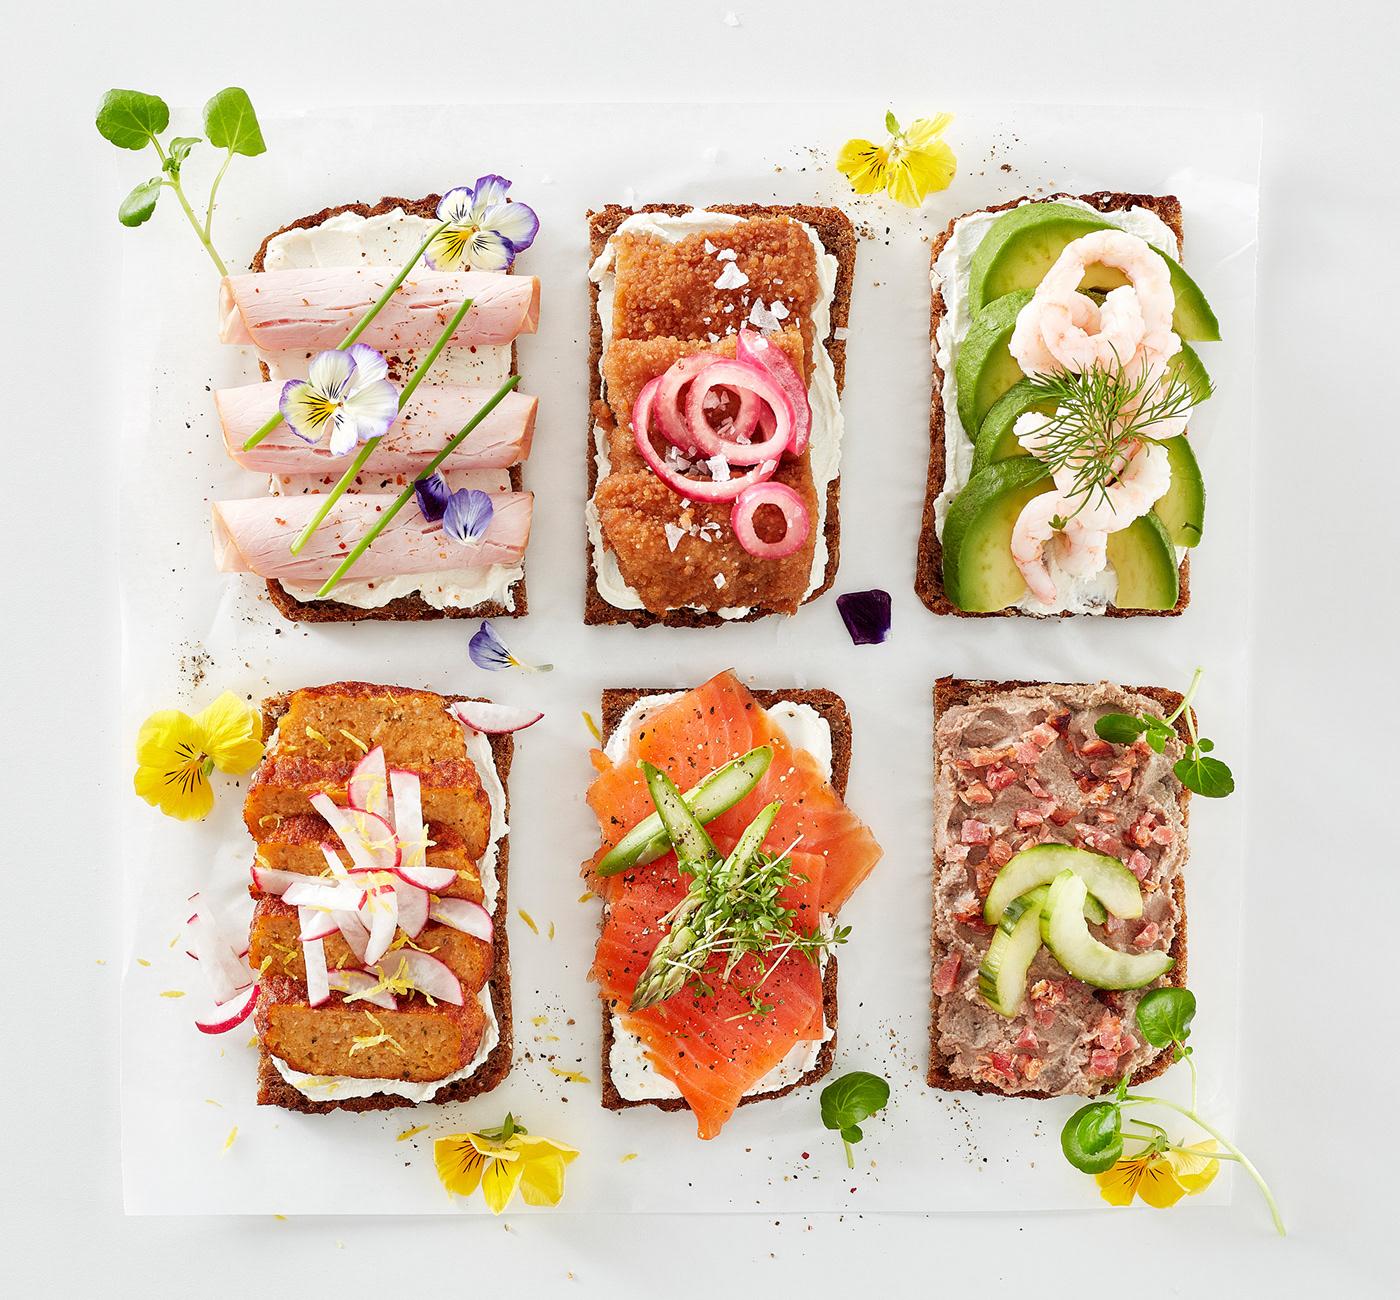 Nordic open sandwiches